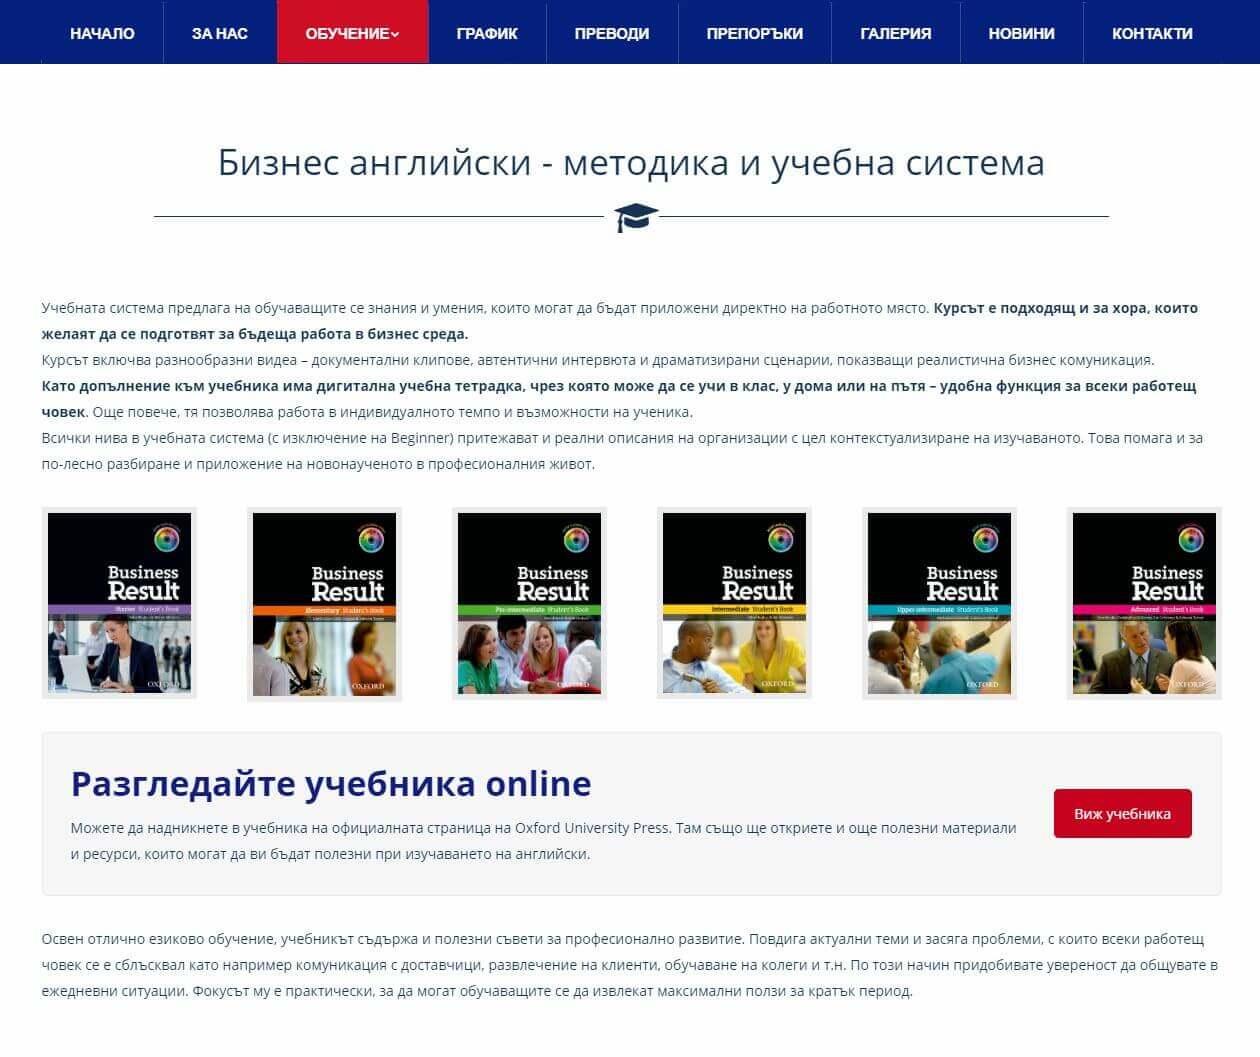 Design, web development & SEO for Language school English House - Media Design